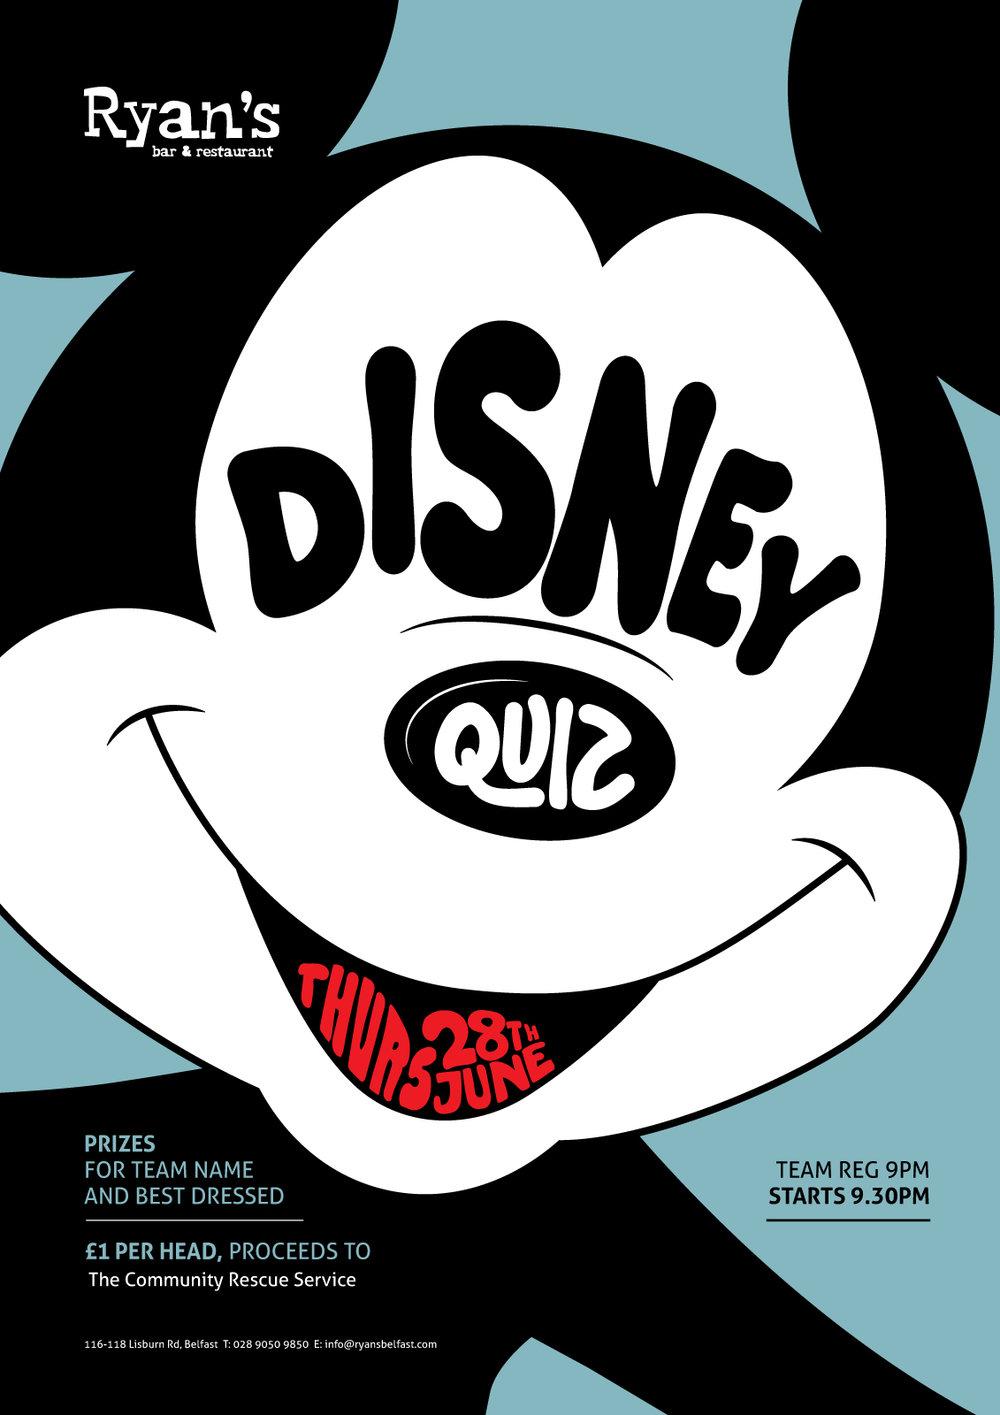 RYANS-Disney-Quiz-June-18.jpg